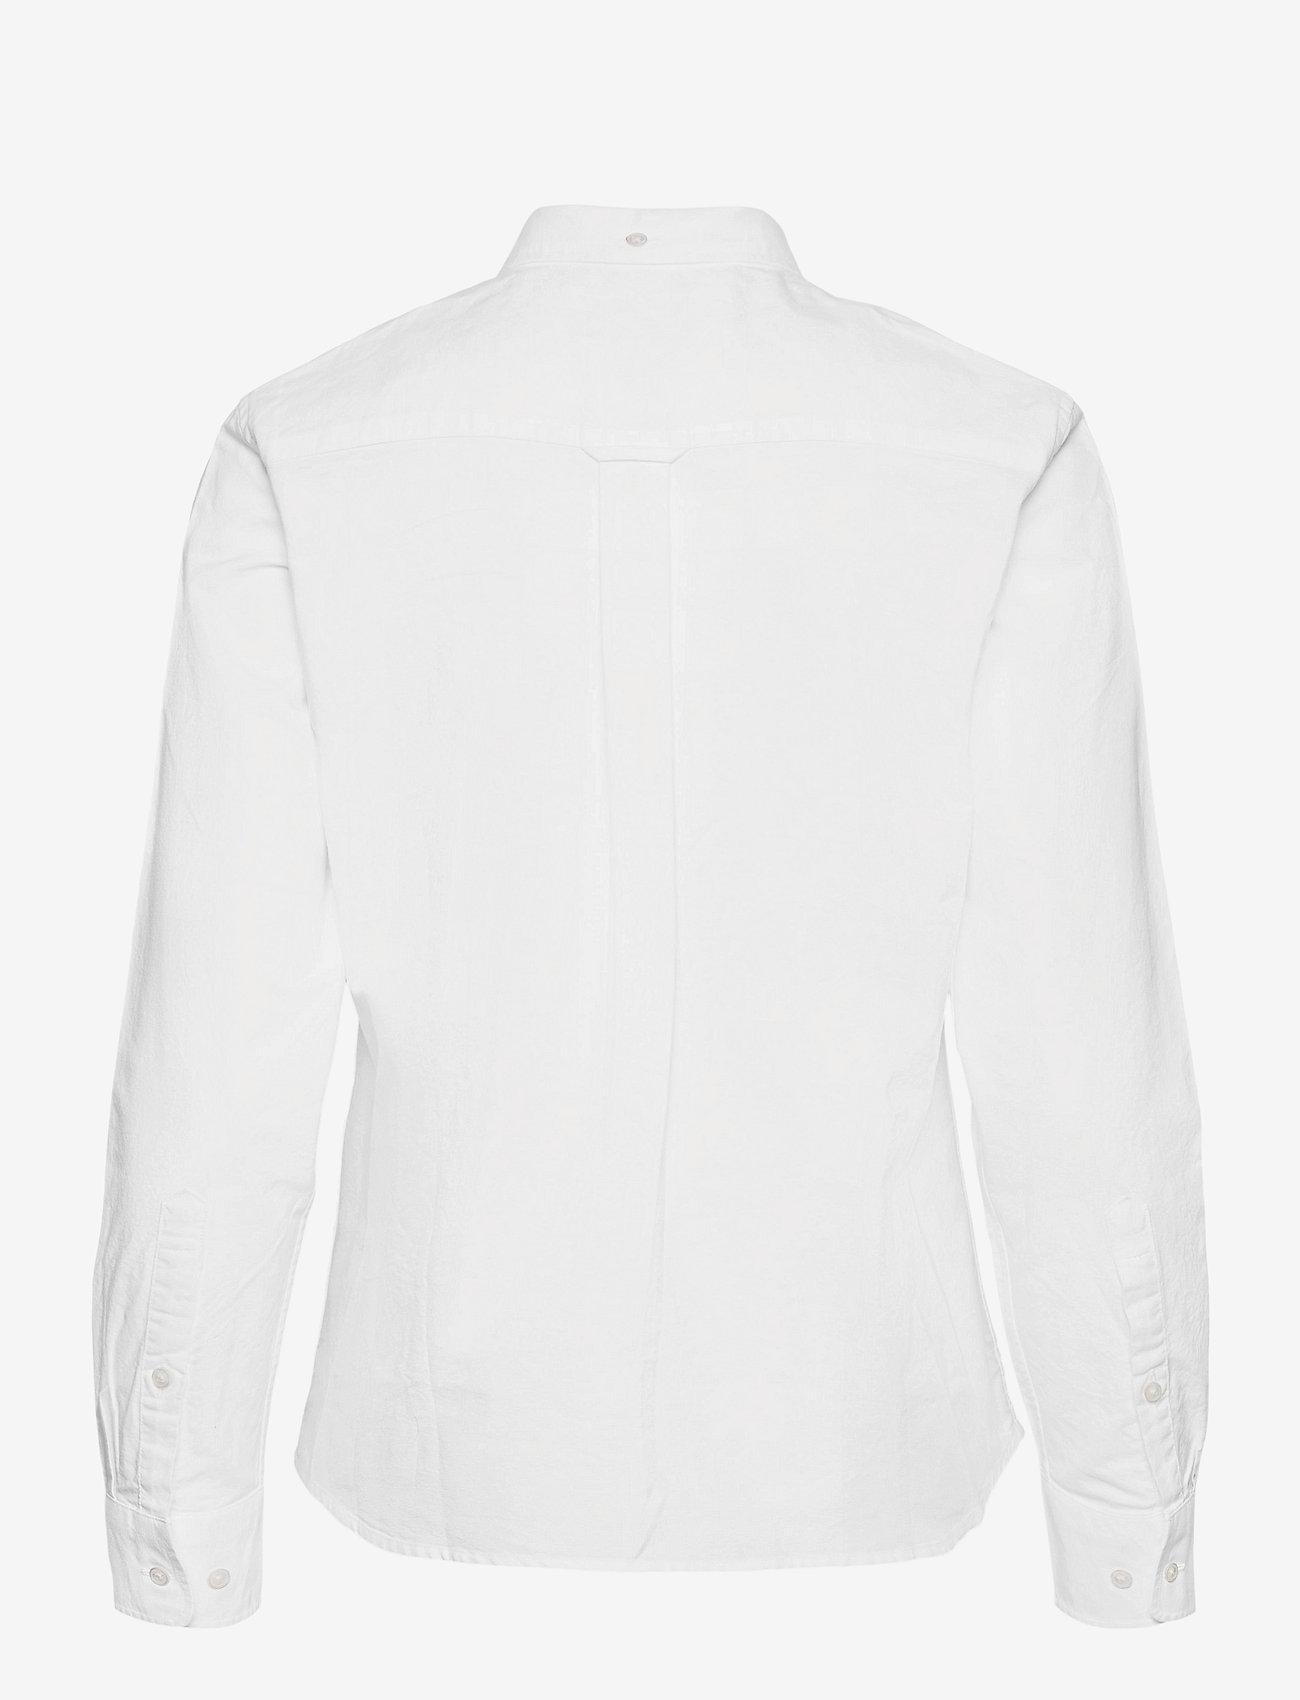 GANT - THE OXFORD SHIRT - long-sleeved shirts - white - 1